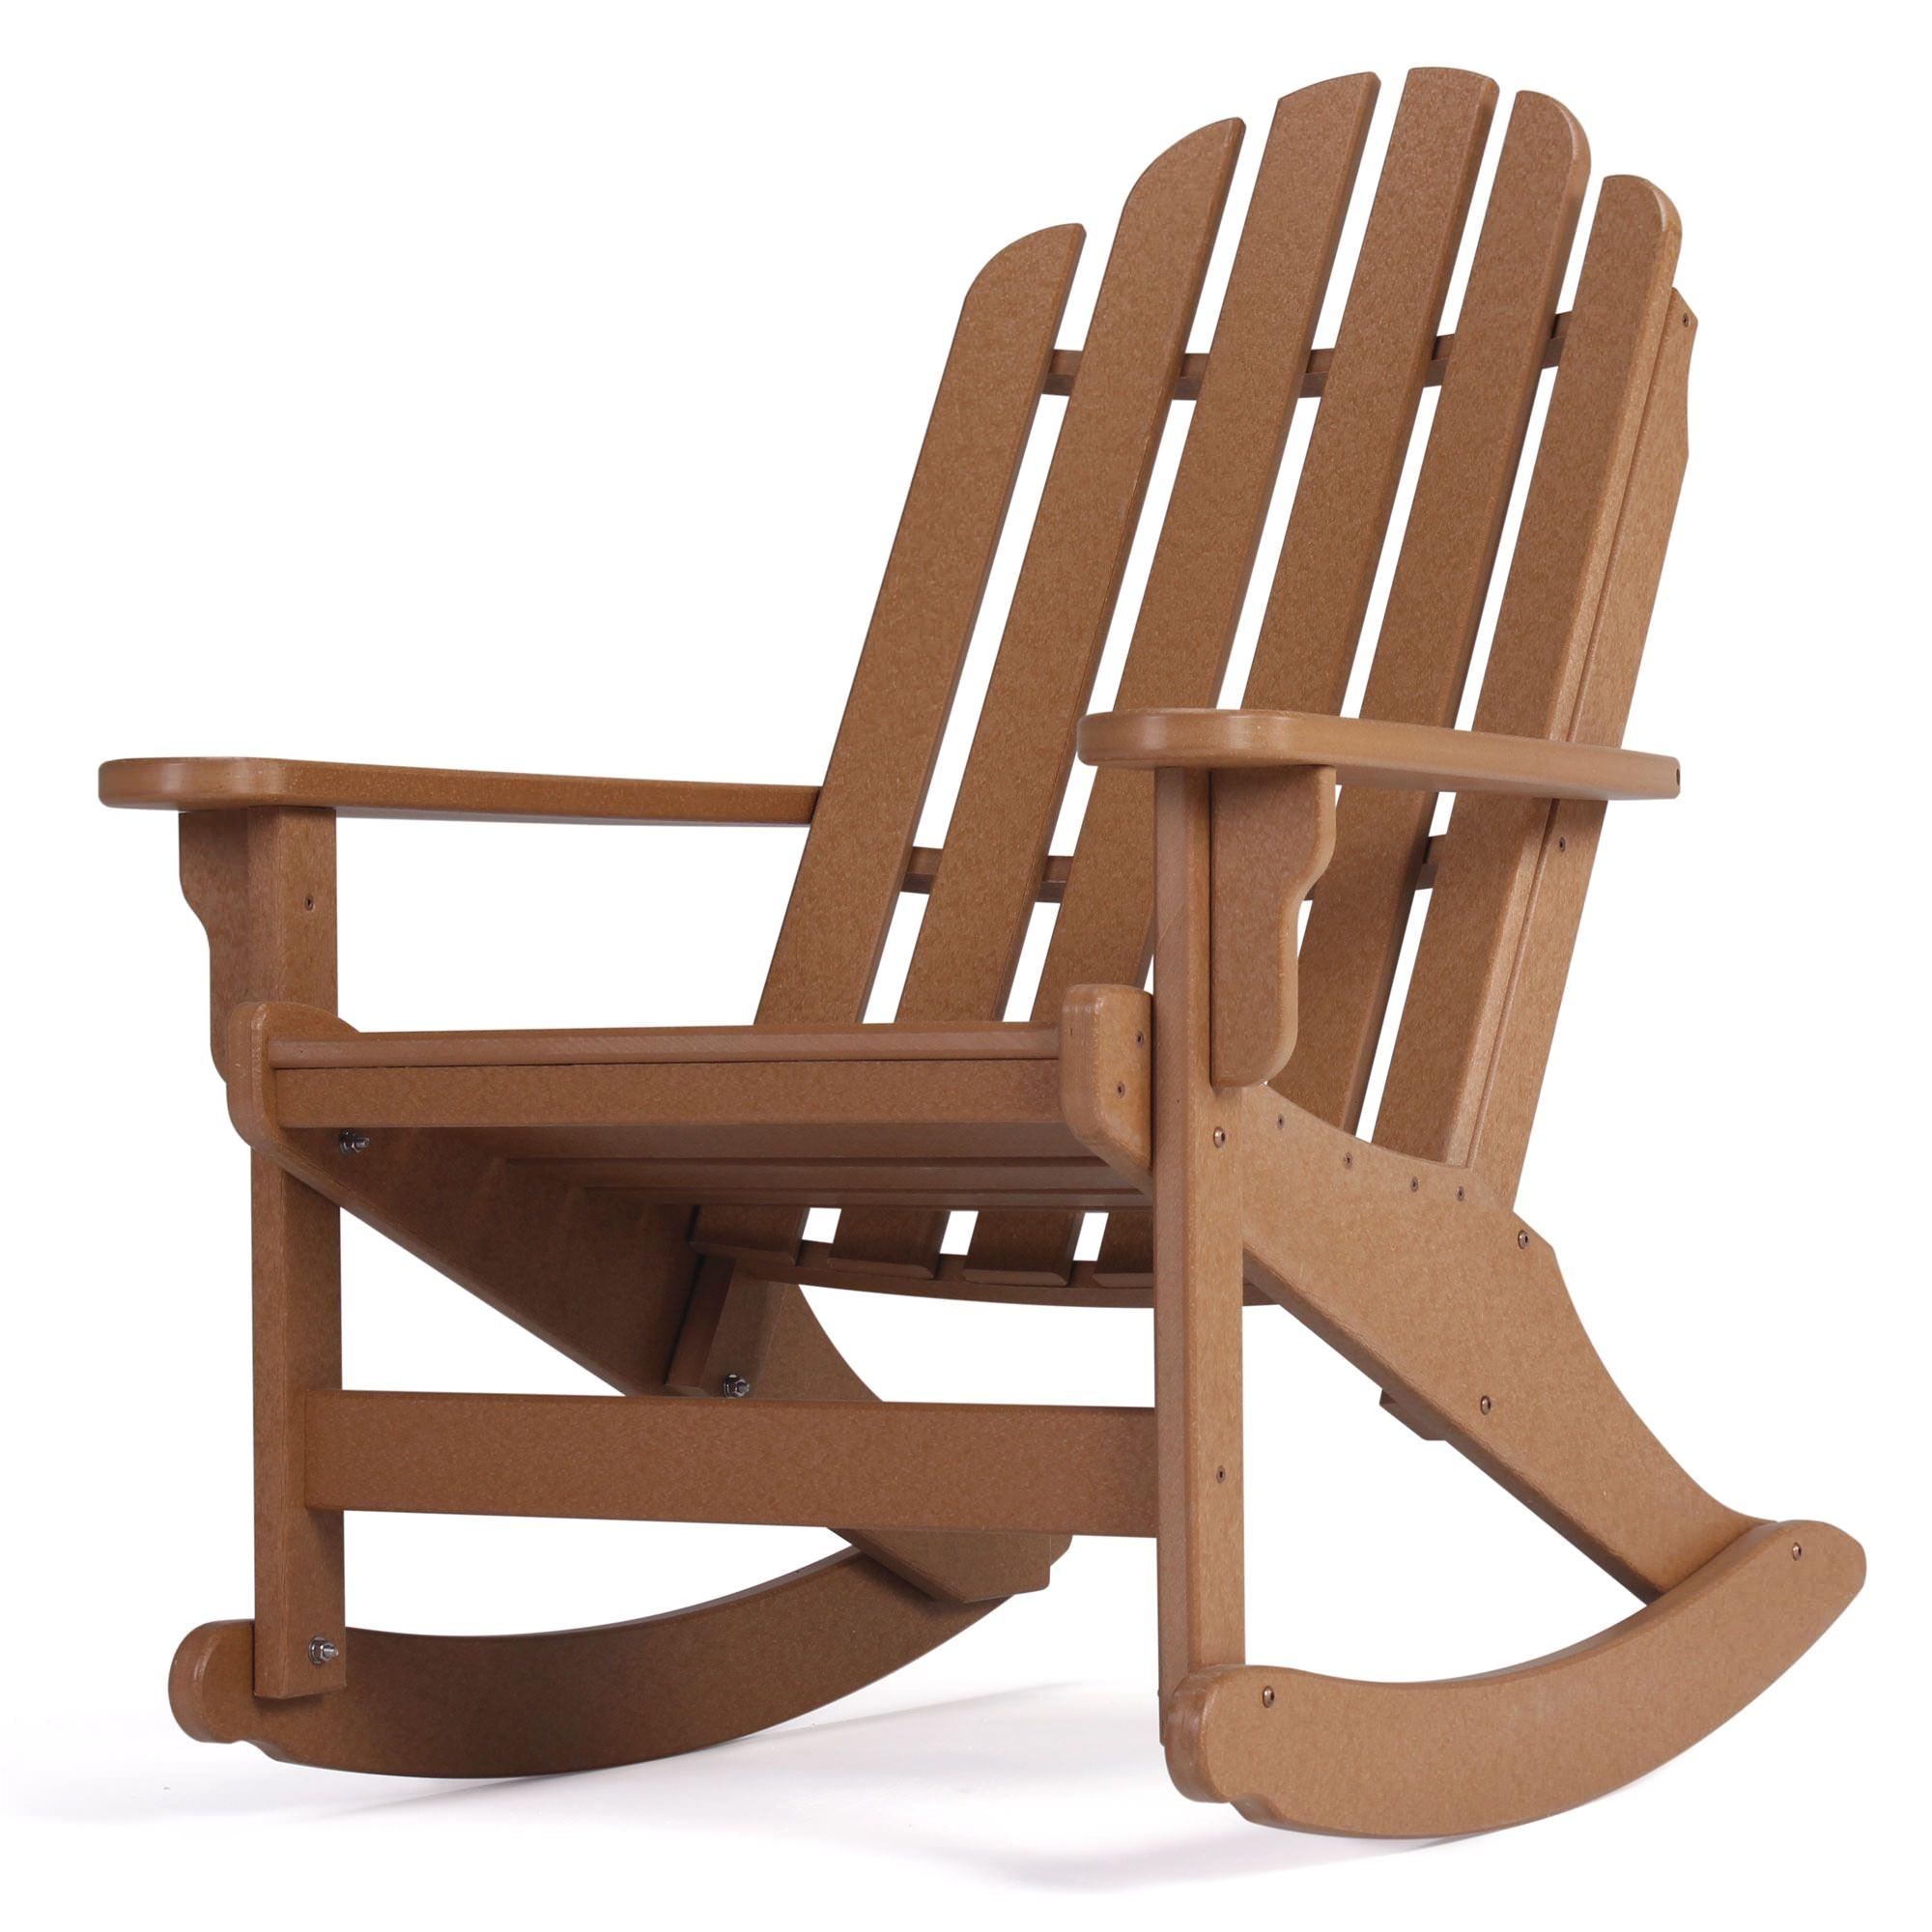 lifetime chairs costco gyneslkg8 7cfvlzo4mtqghuh9ddztrthd2dot6wmhk2g